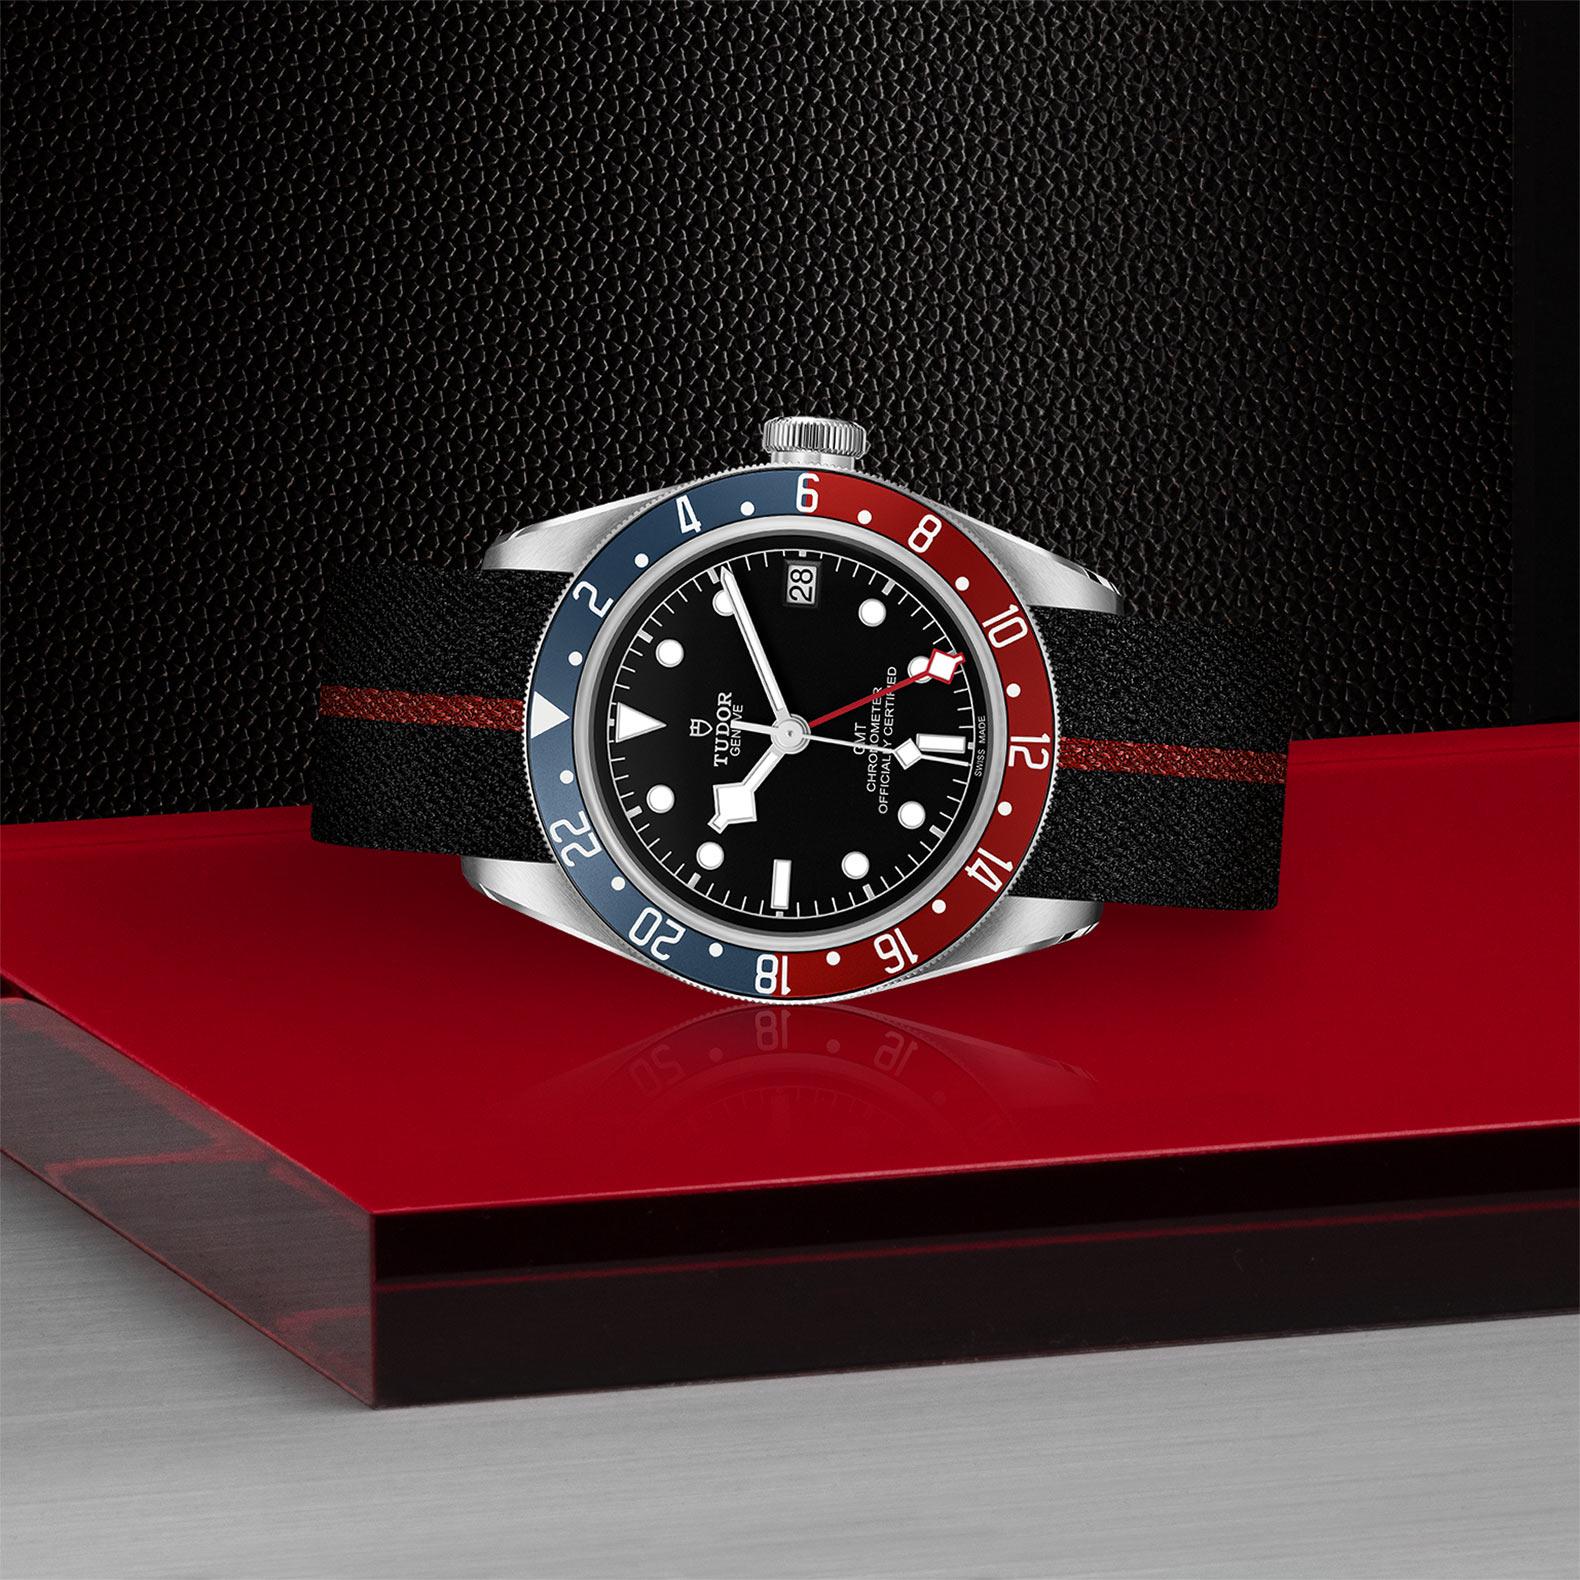 TUDOR Black Bay GMT - M79830RB-0003